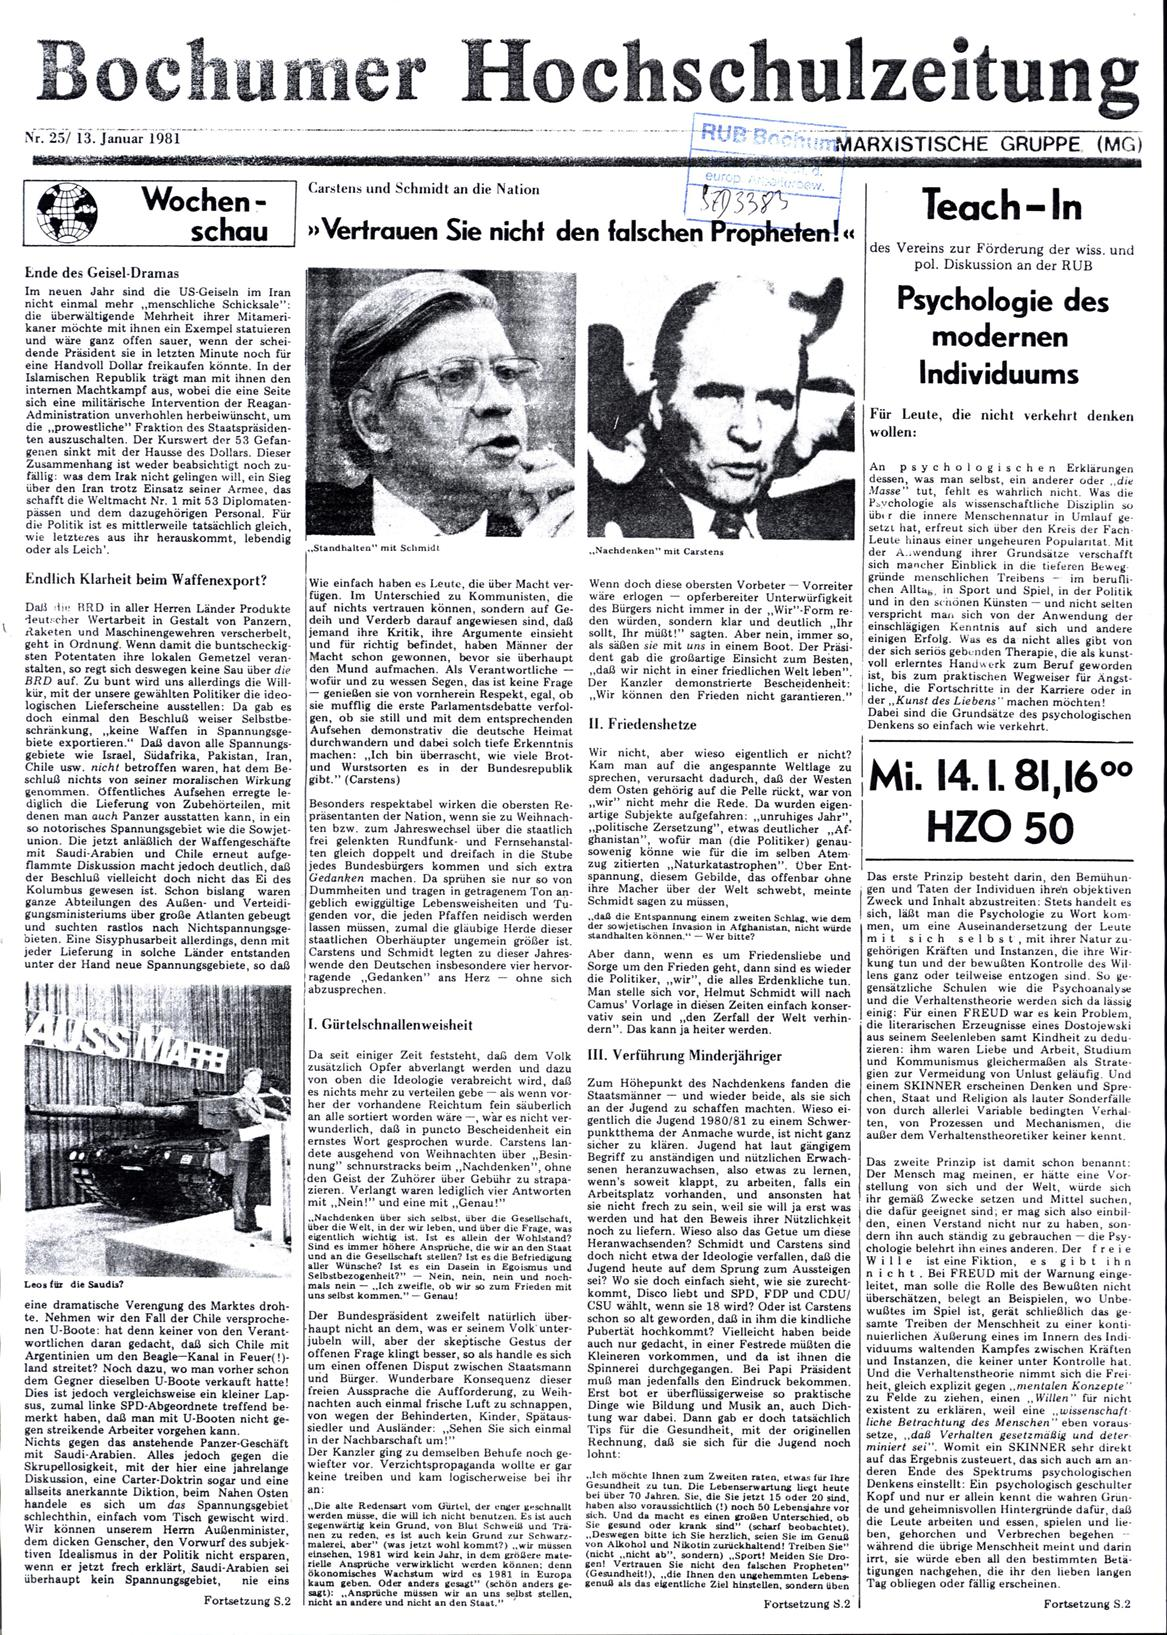 Bochum_BHZ_19810113_025_001